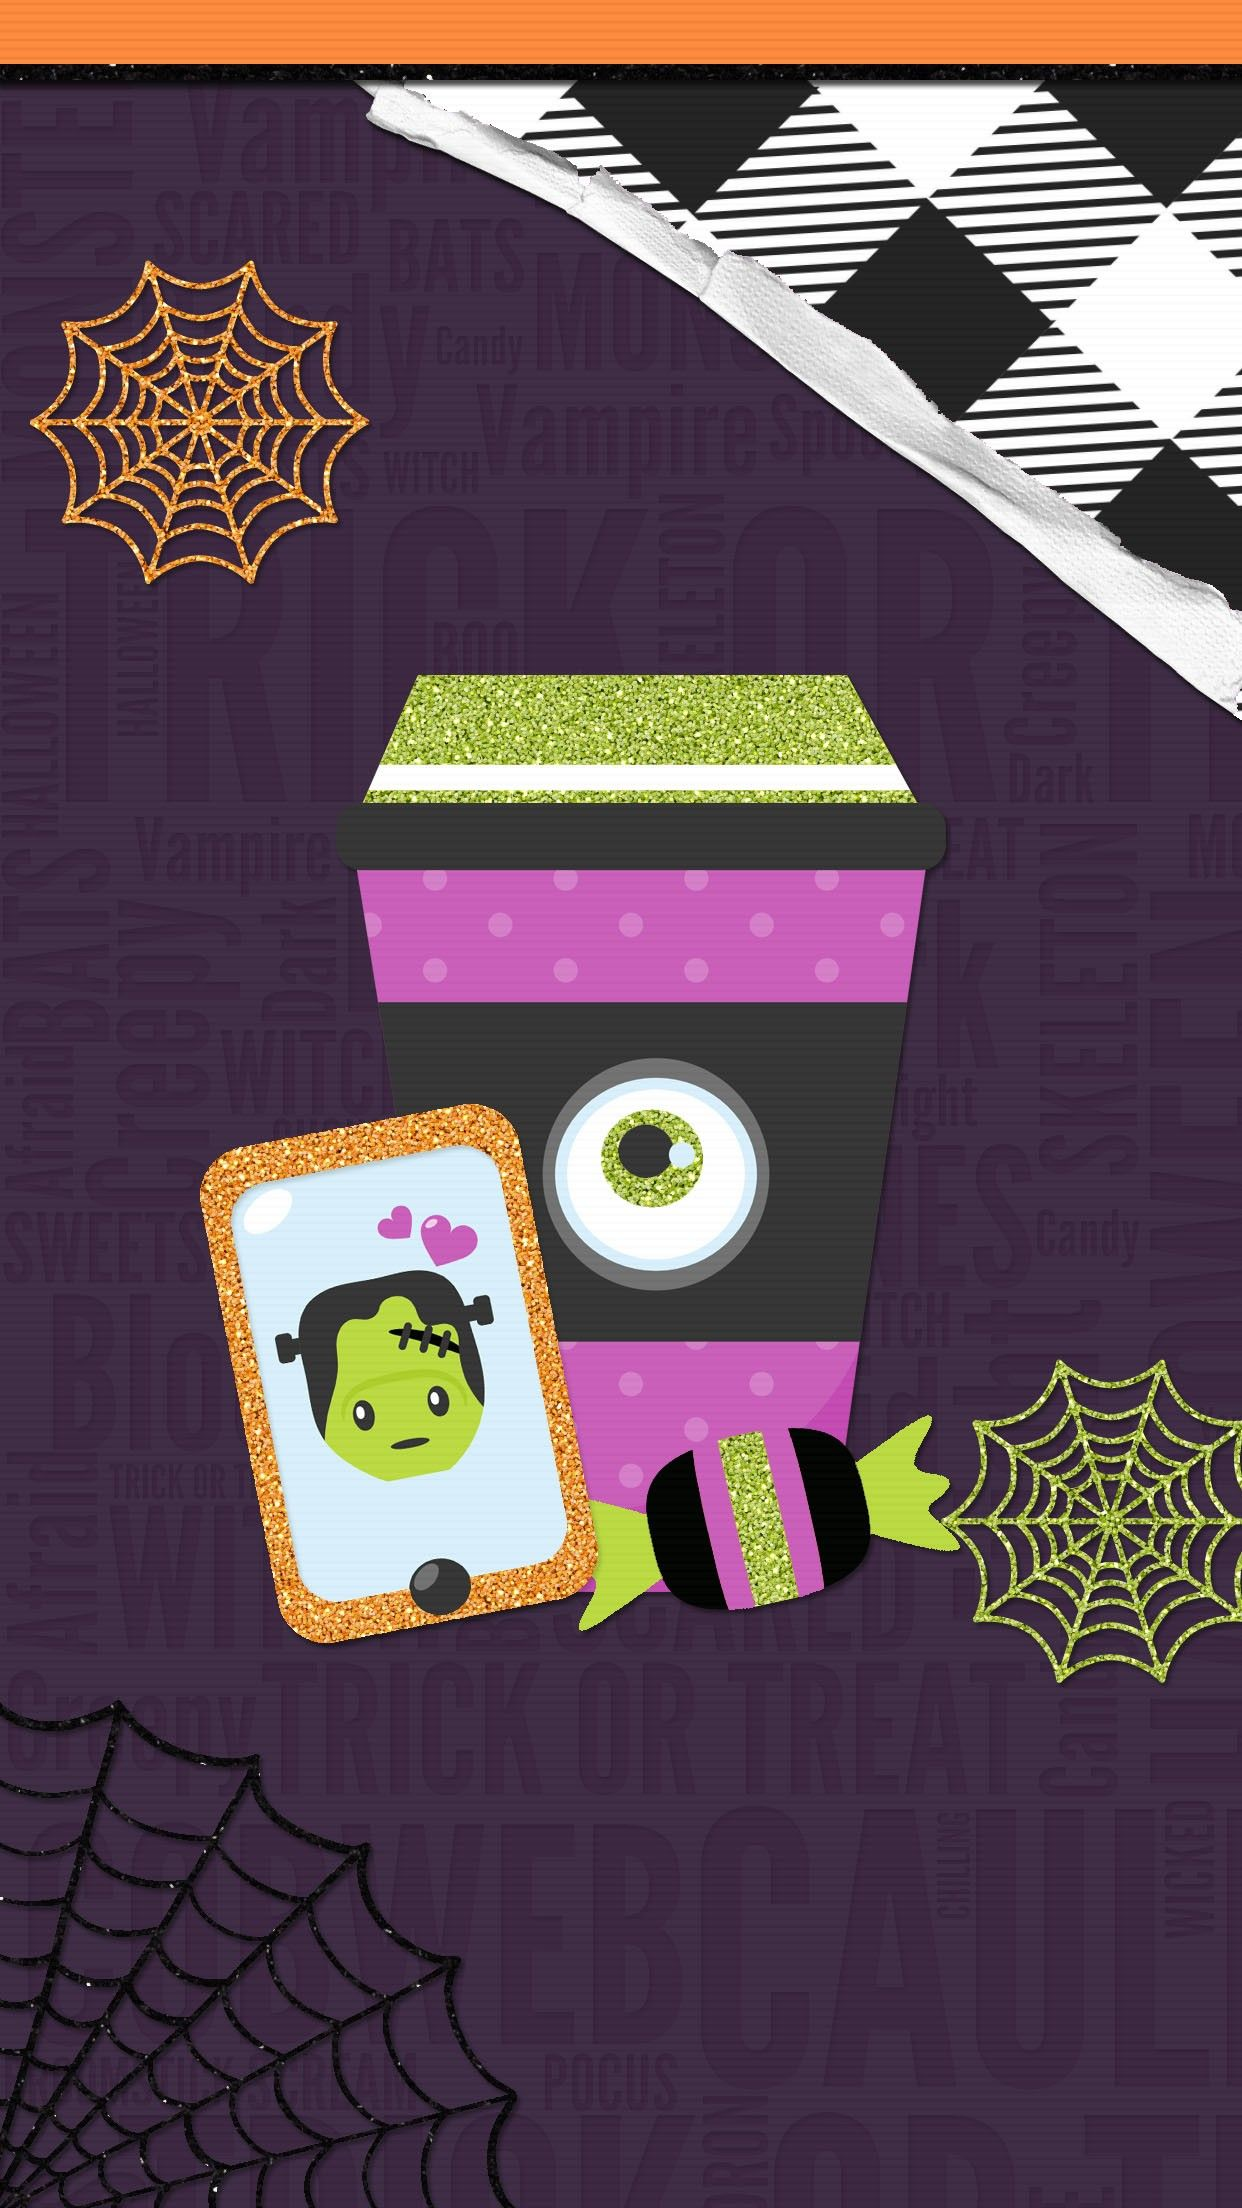 Halloween wallpaper image by Shea Terry on Seasonal